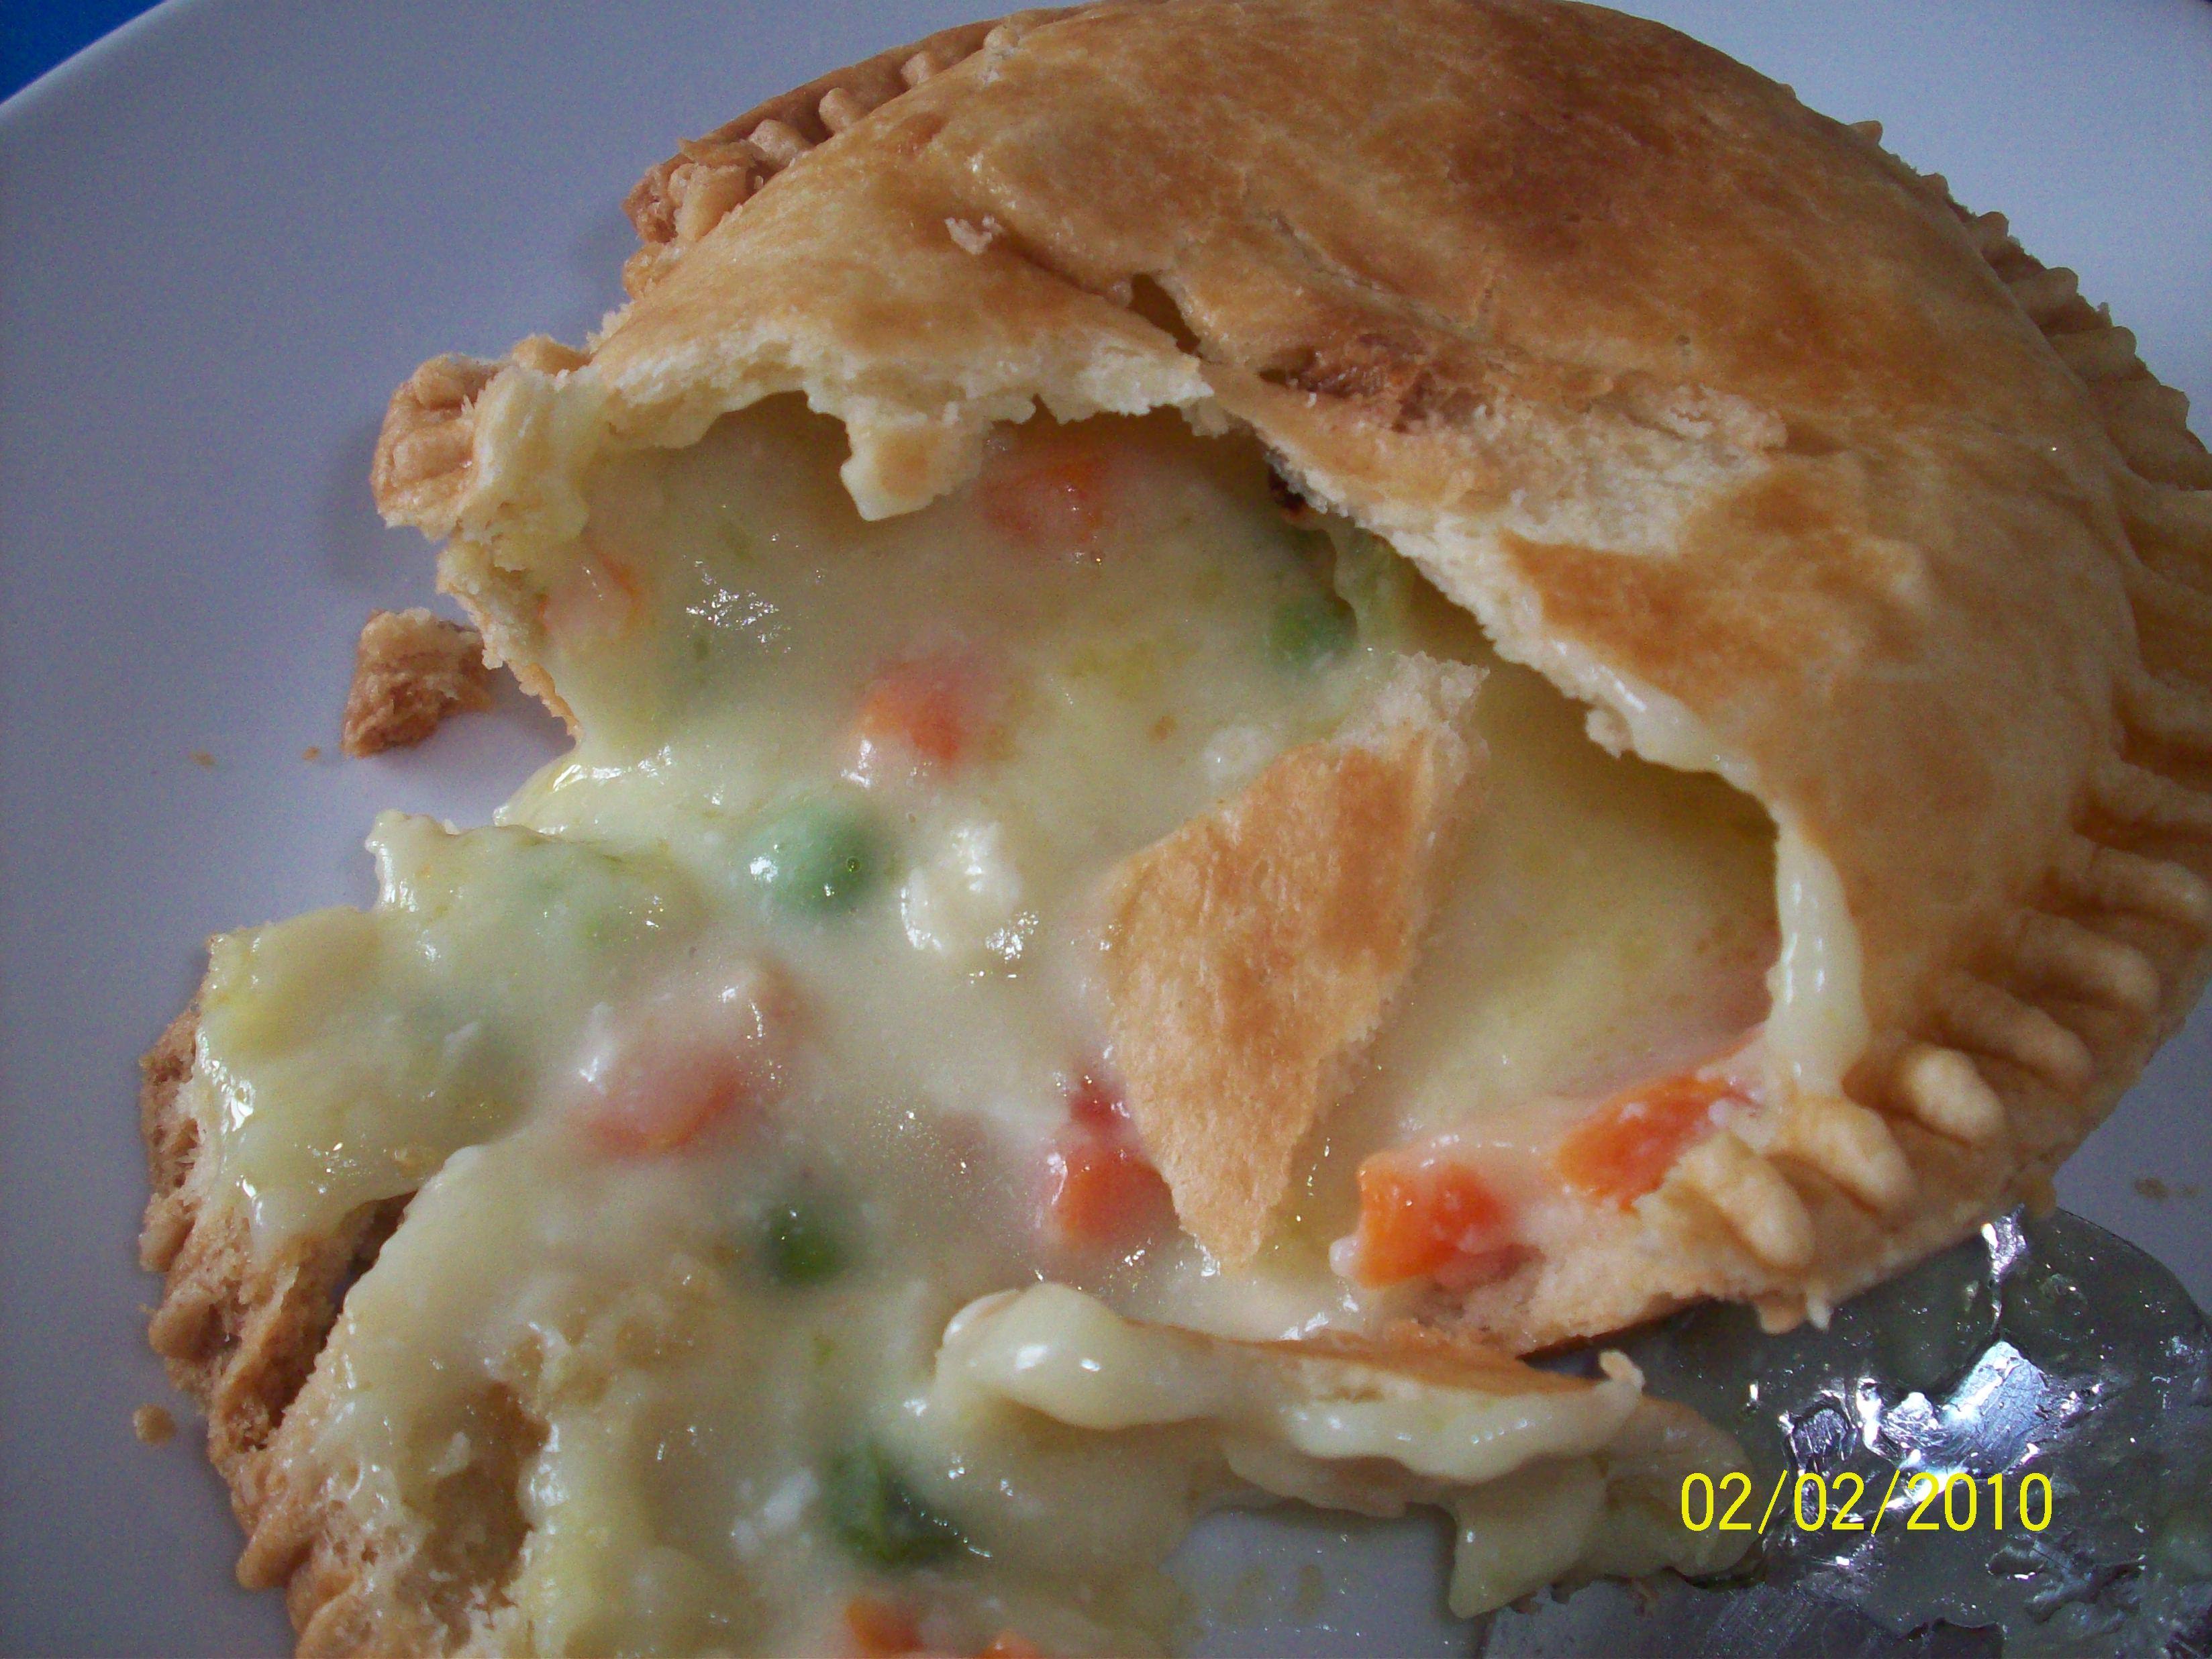 http://foodloader.net/cutie_2010-02-02_Chicken_Pot_Pie.jpg